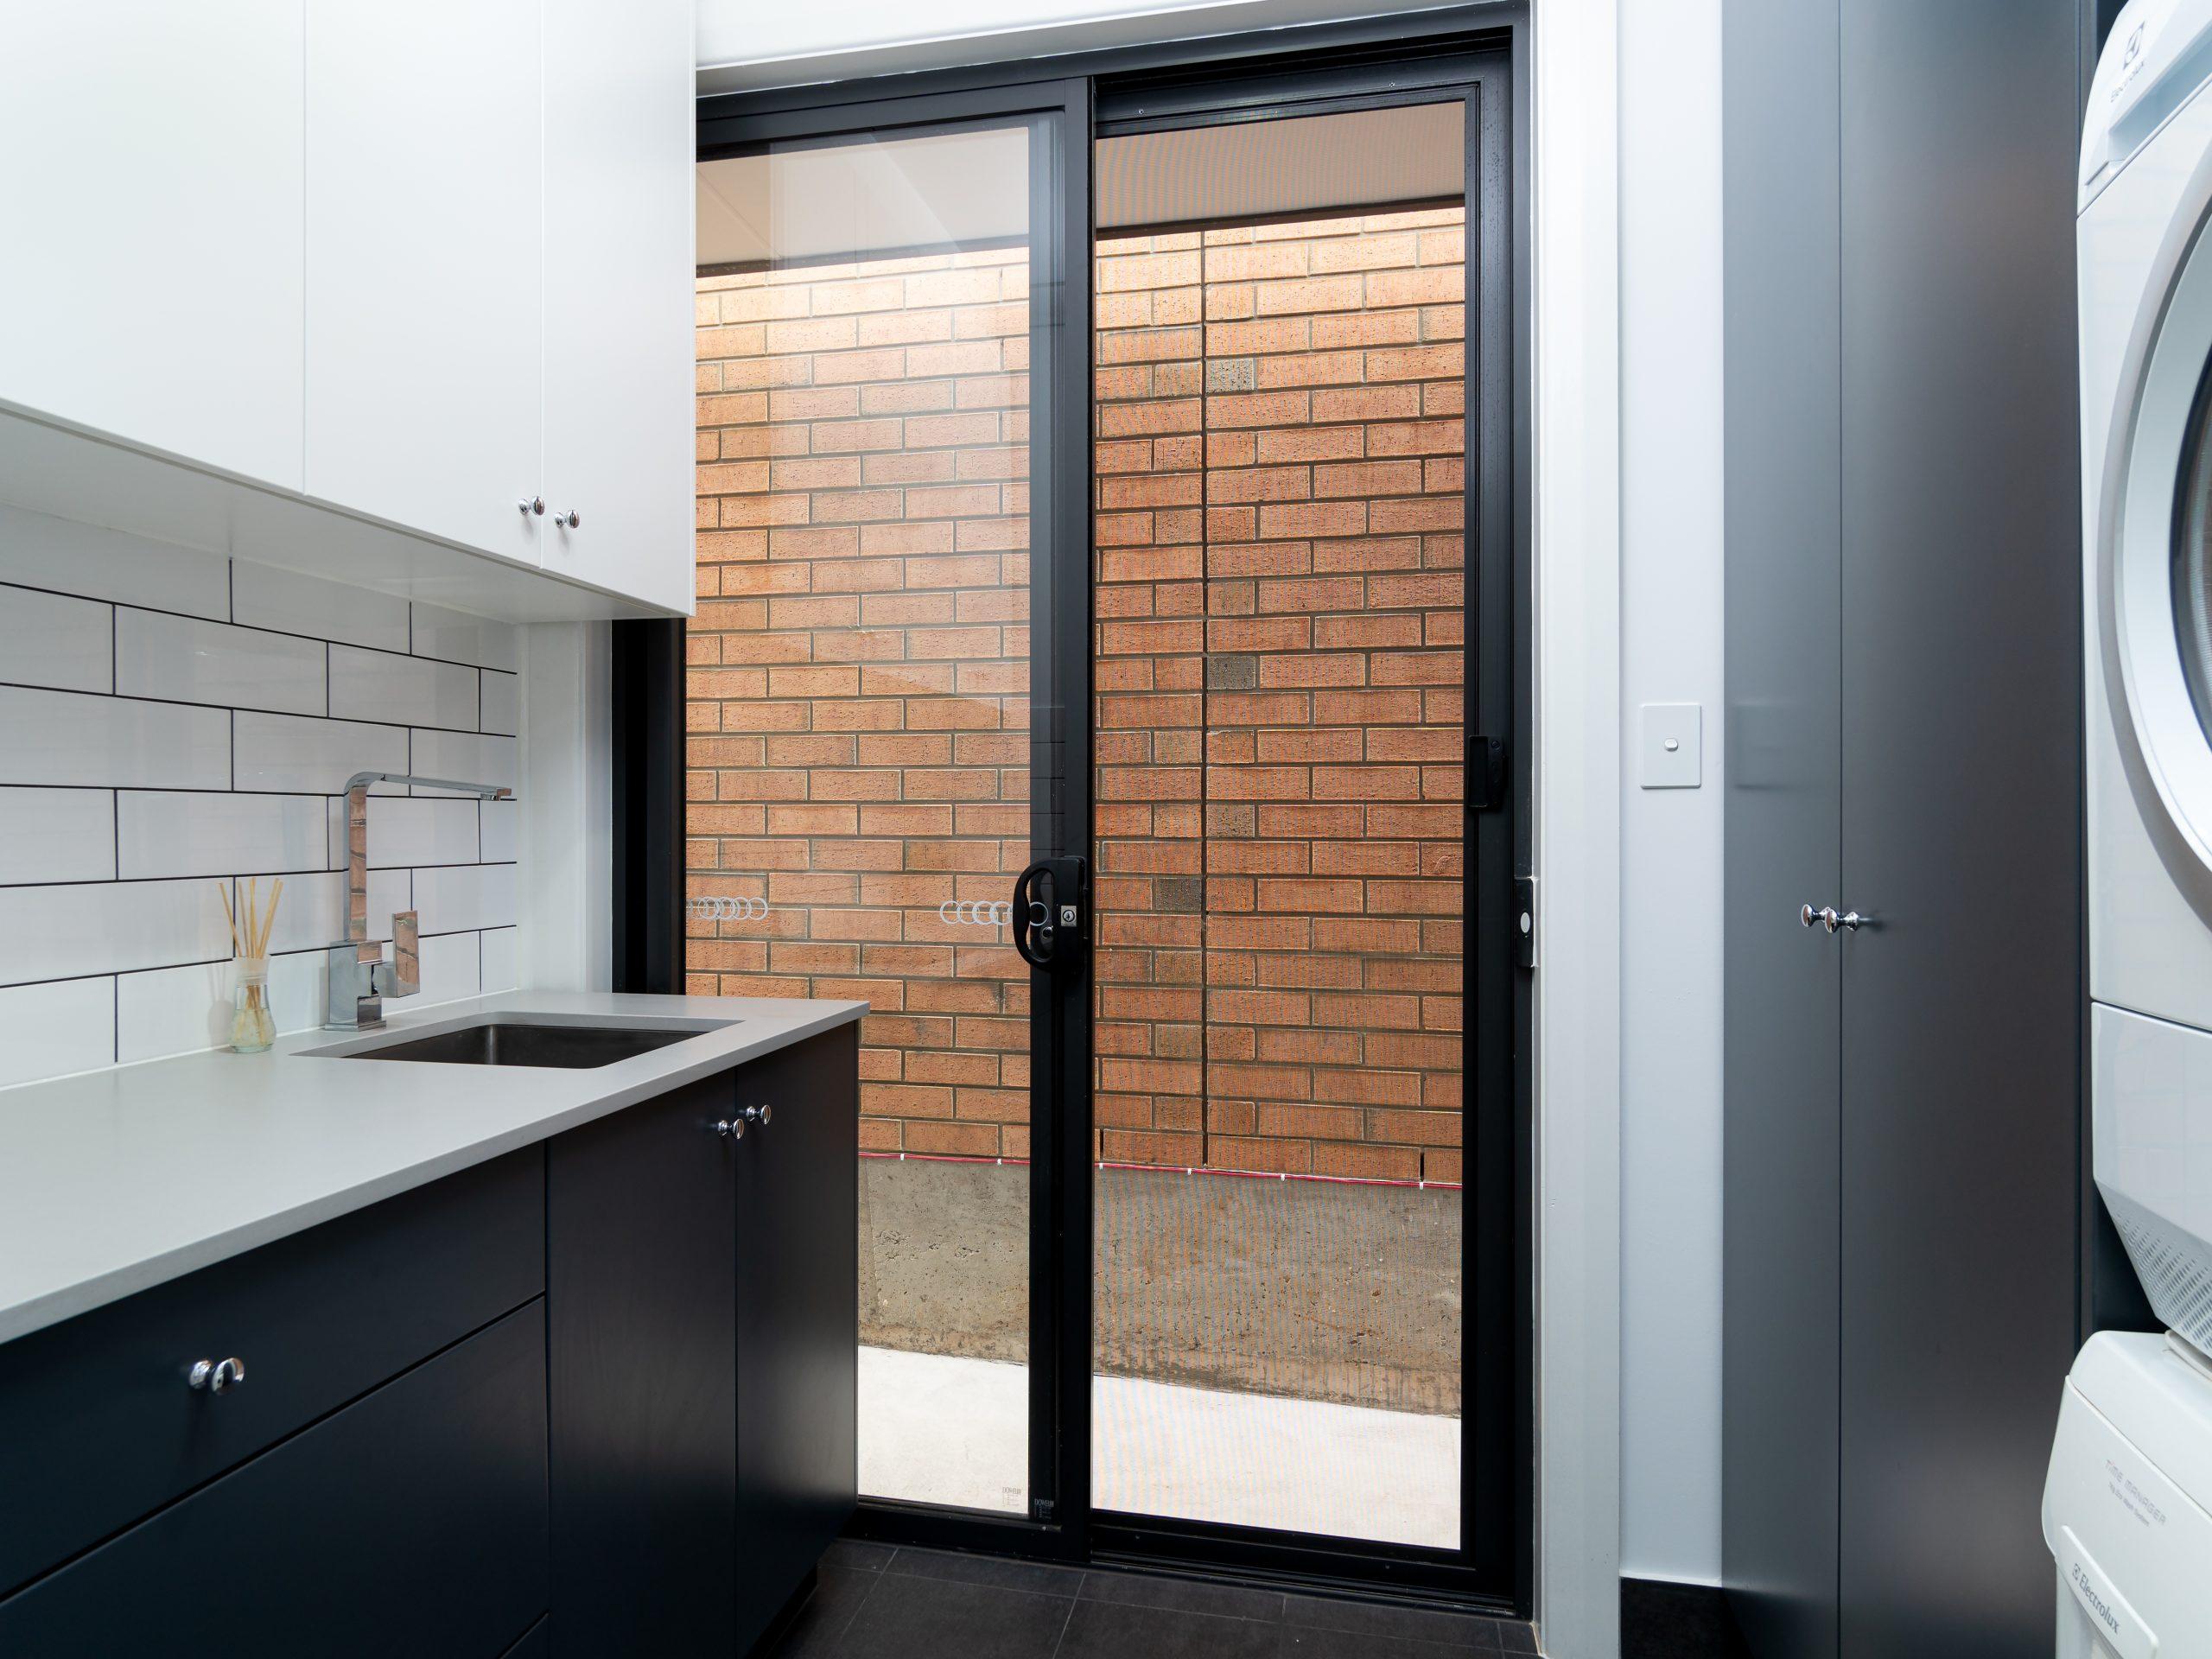 Kidman Park - Kidman - HBC Homes Adelaide - _DSC1153-Edit